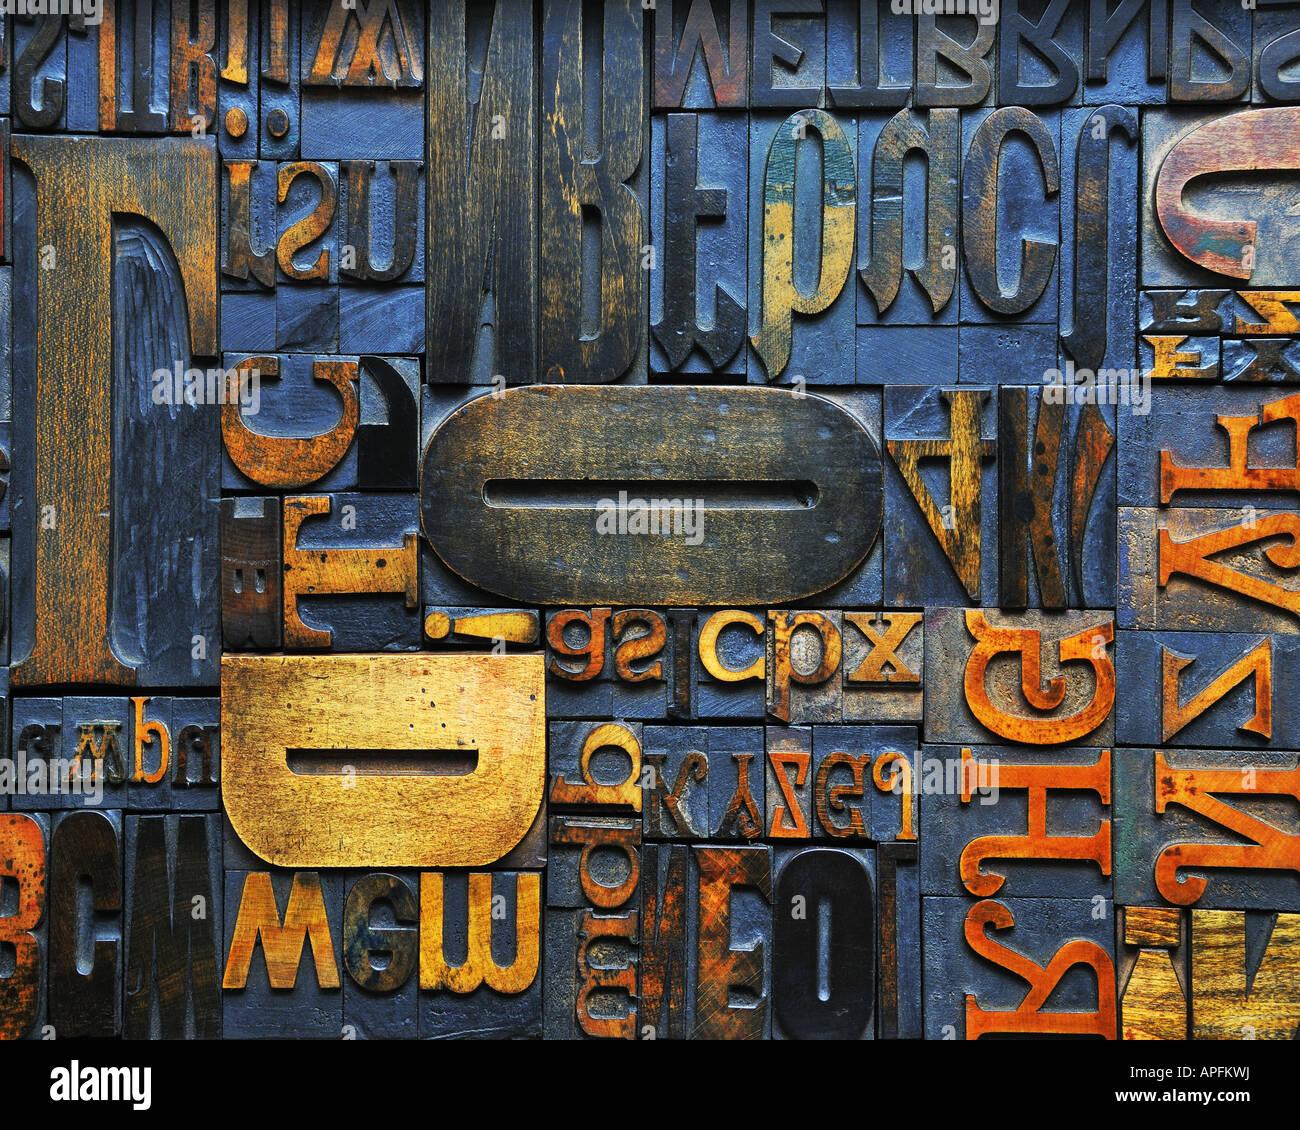 Konzept-Fotografie: Das Wort Stockfoto